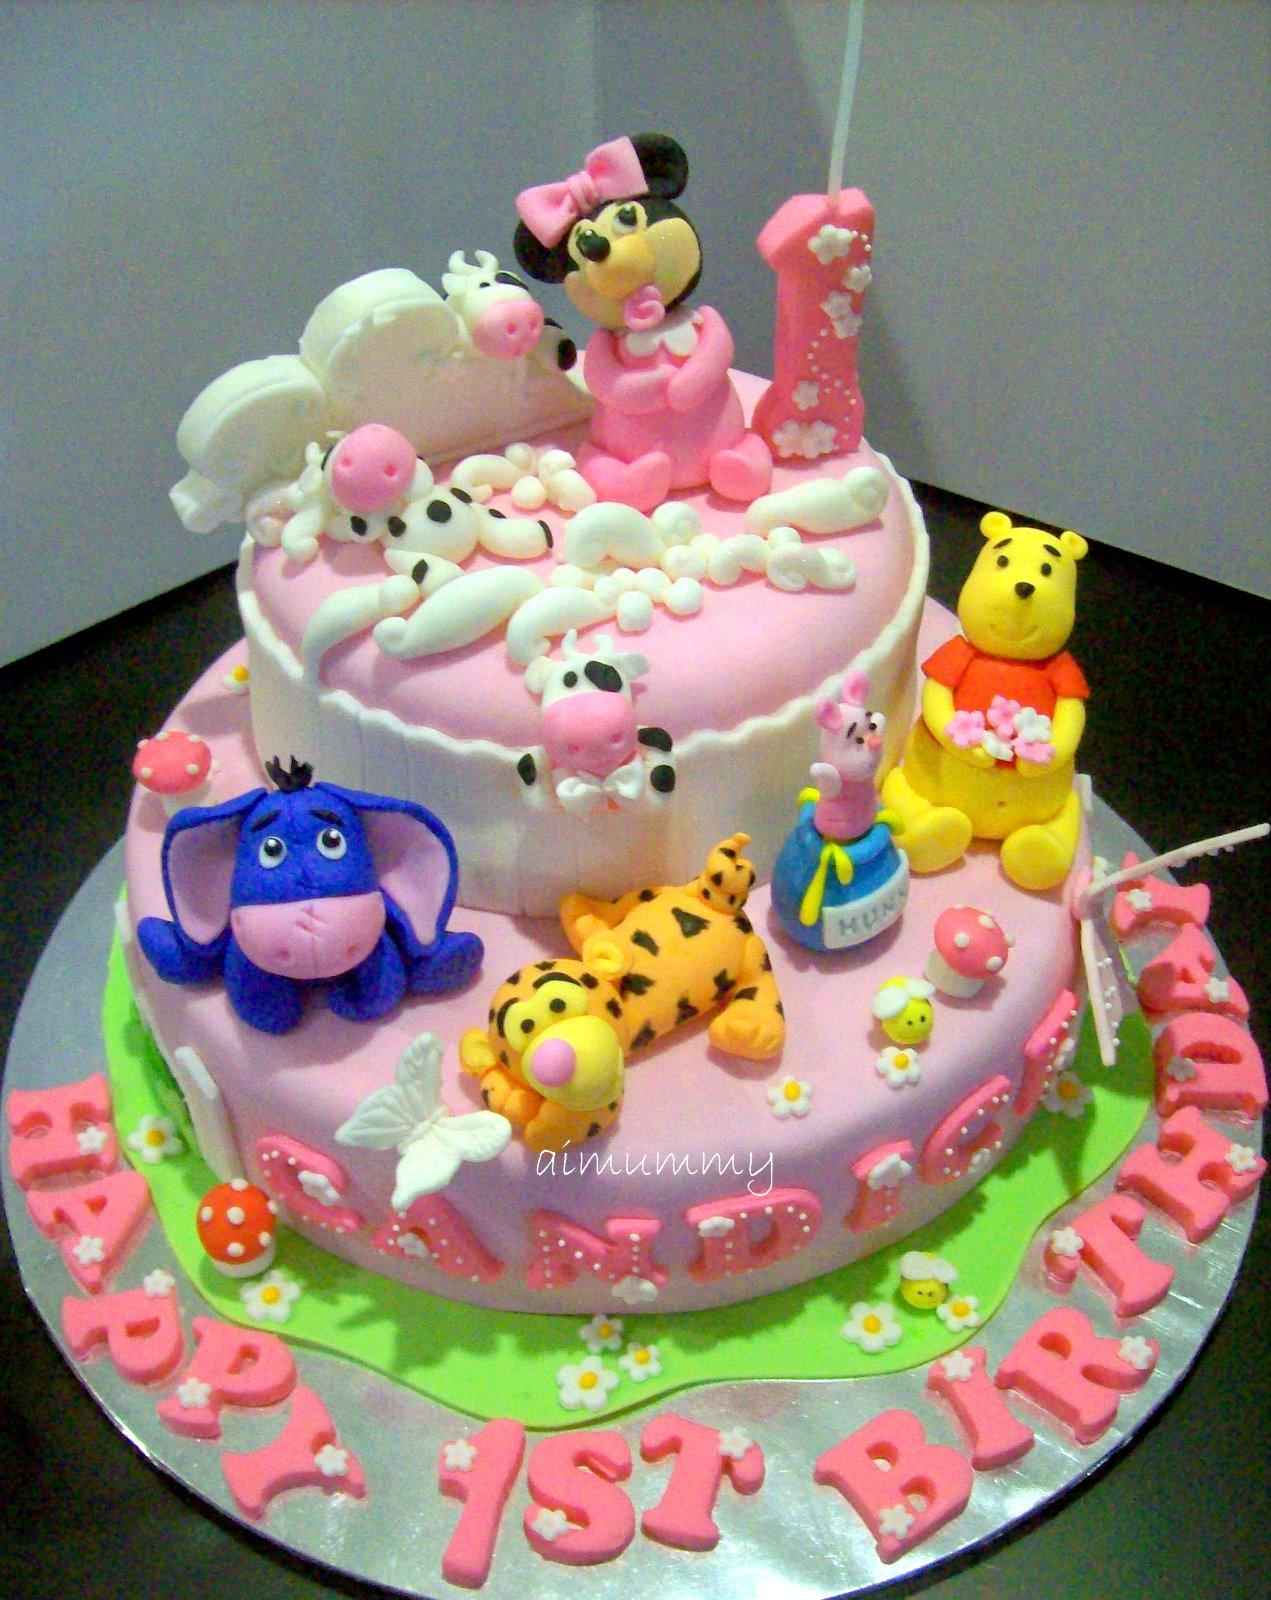 Astonishing Baby Minnie Cake Amazing Cake Ideas Birthday Cards Printable Riciscafe Filternl